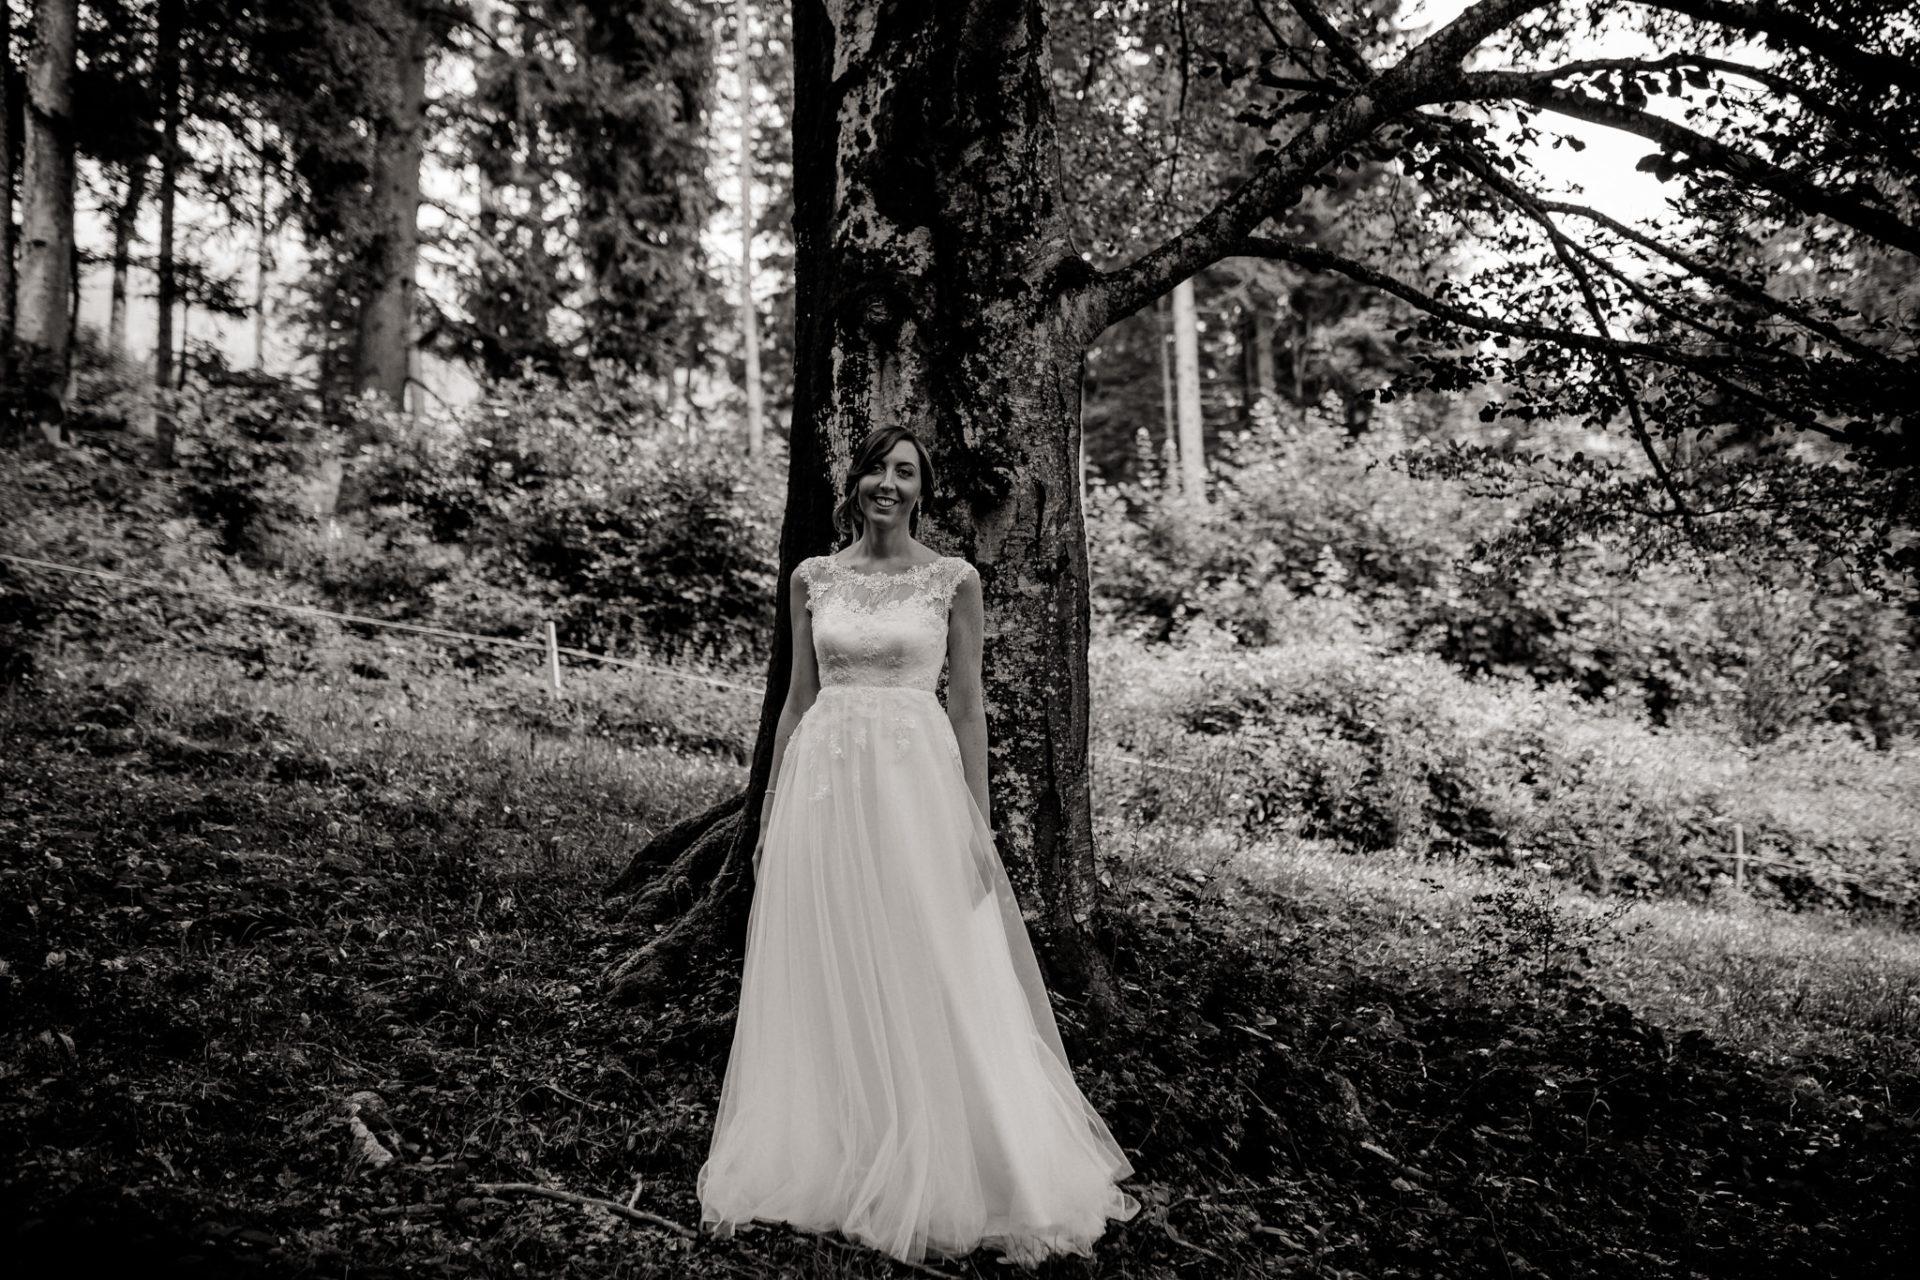 wedding photographer Lech Ahlberg-mountain wedding- bride portraits unposed